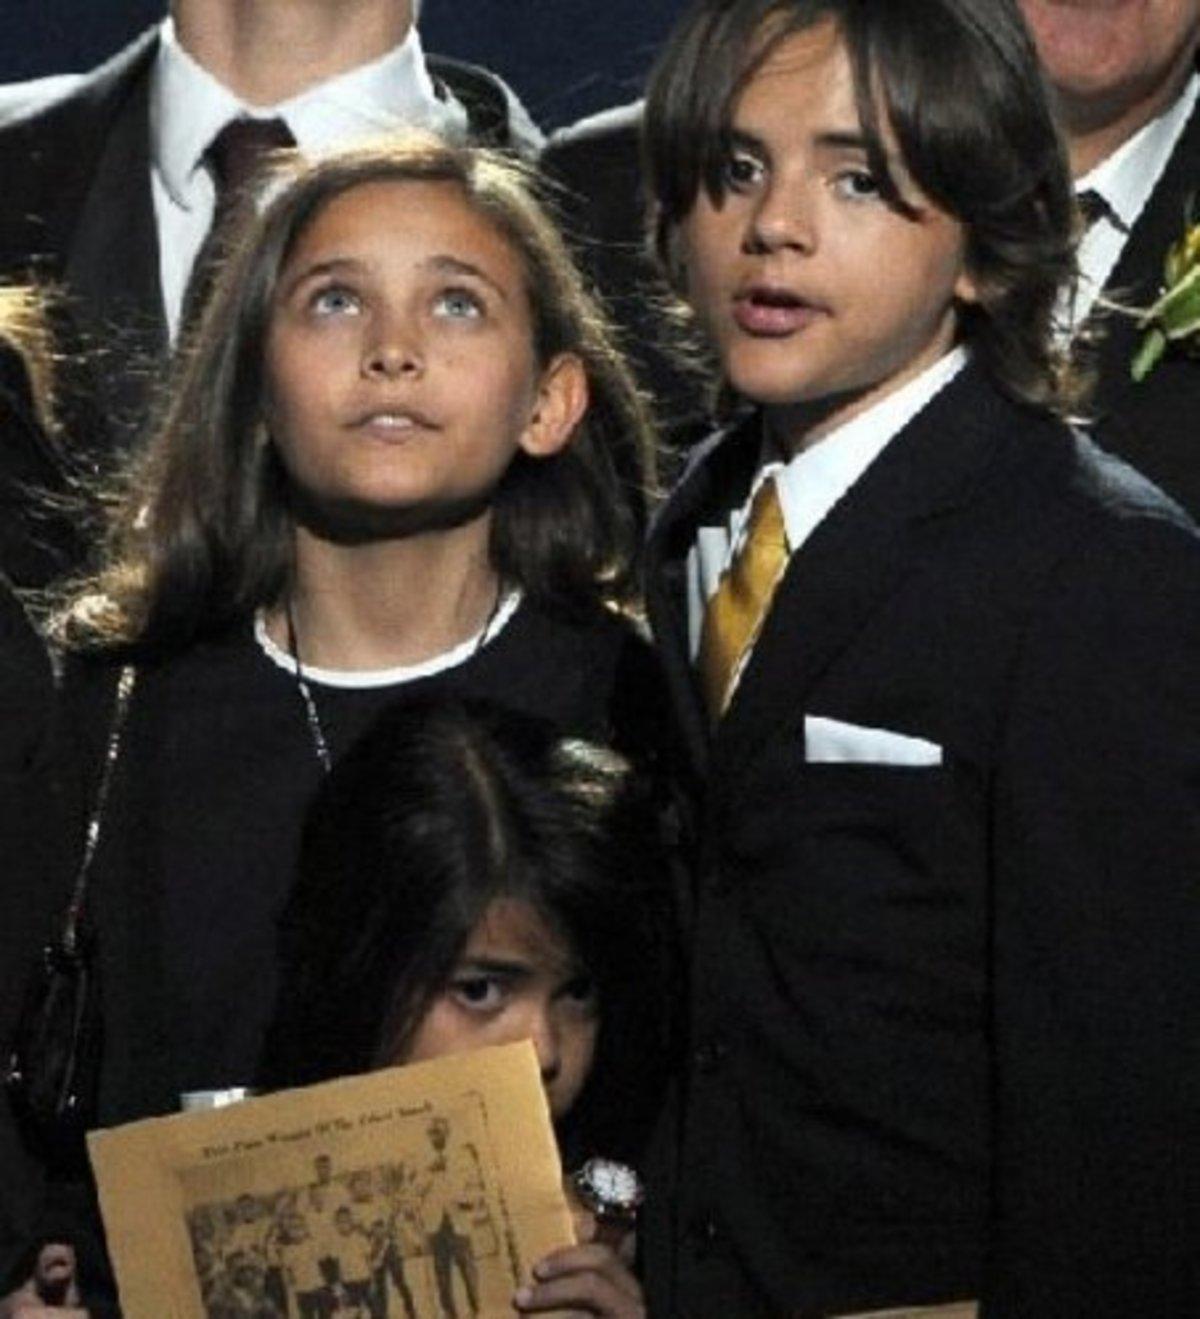 Tα παιδιά του Jackson θα τραγουδήσουν στα Grammy! | Newsit.gr